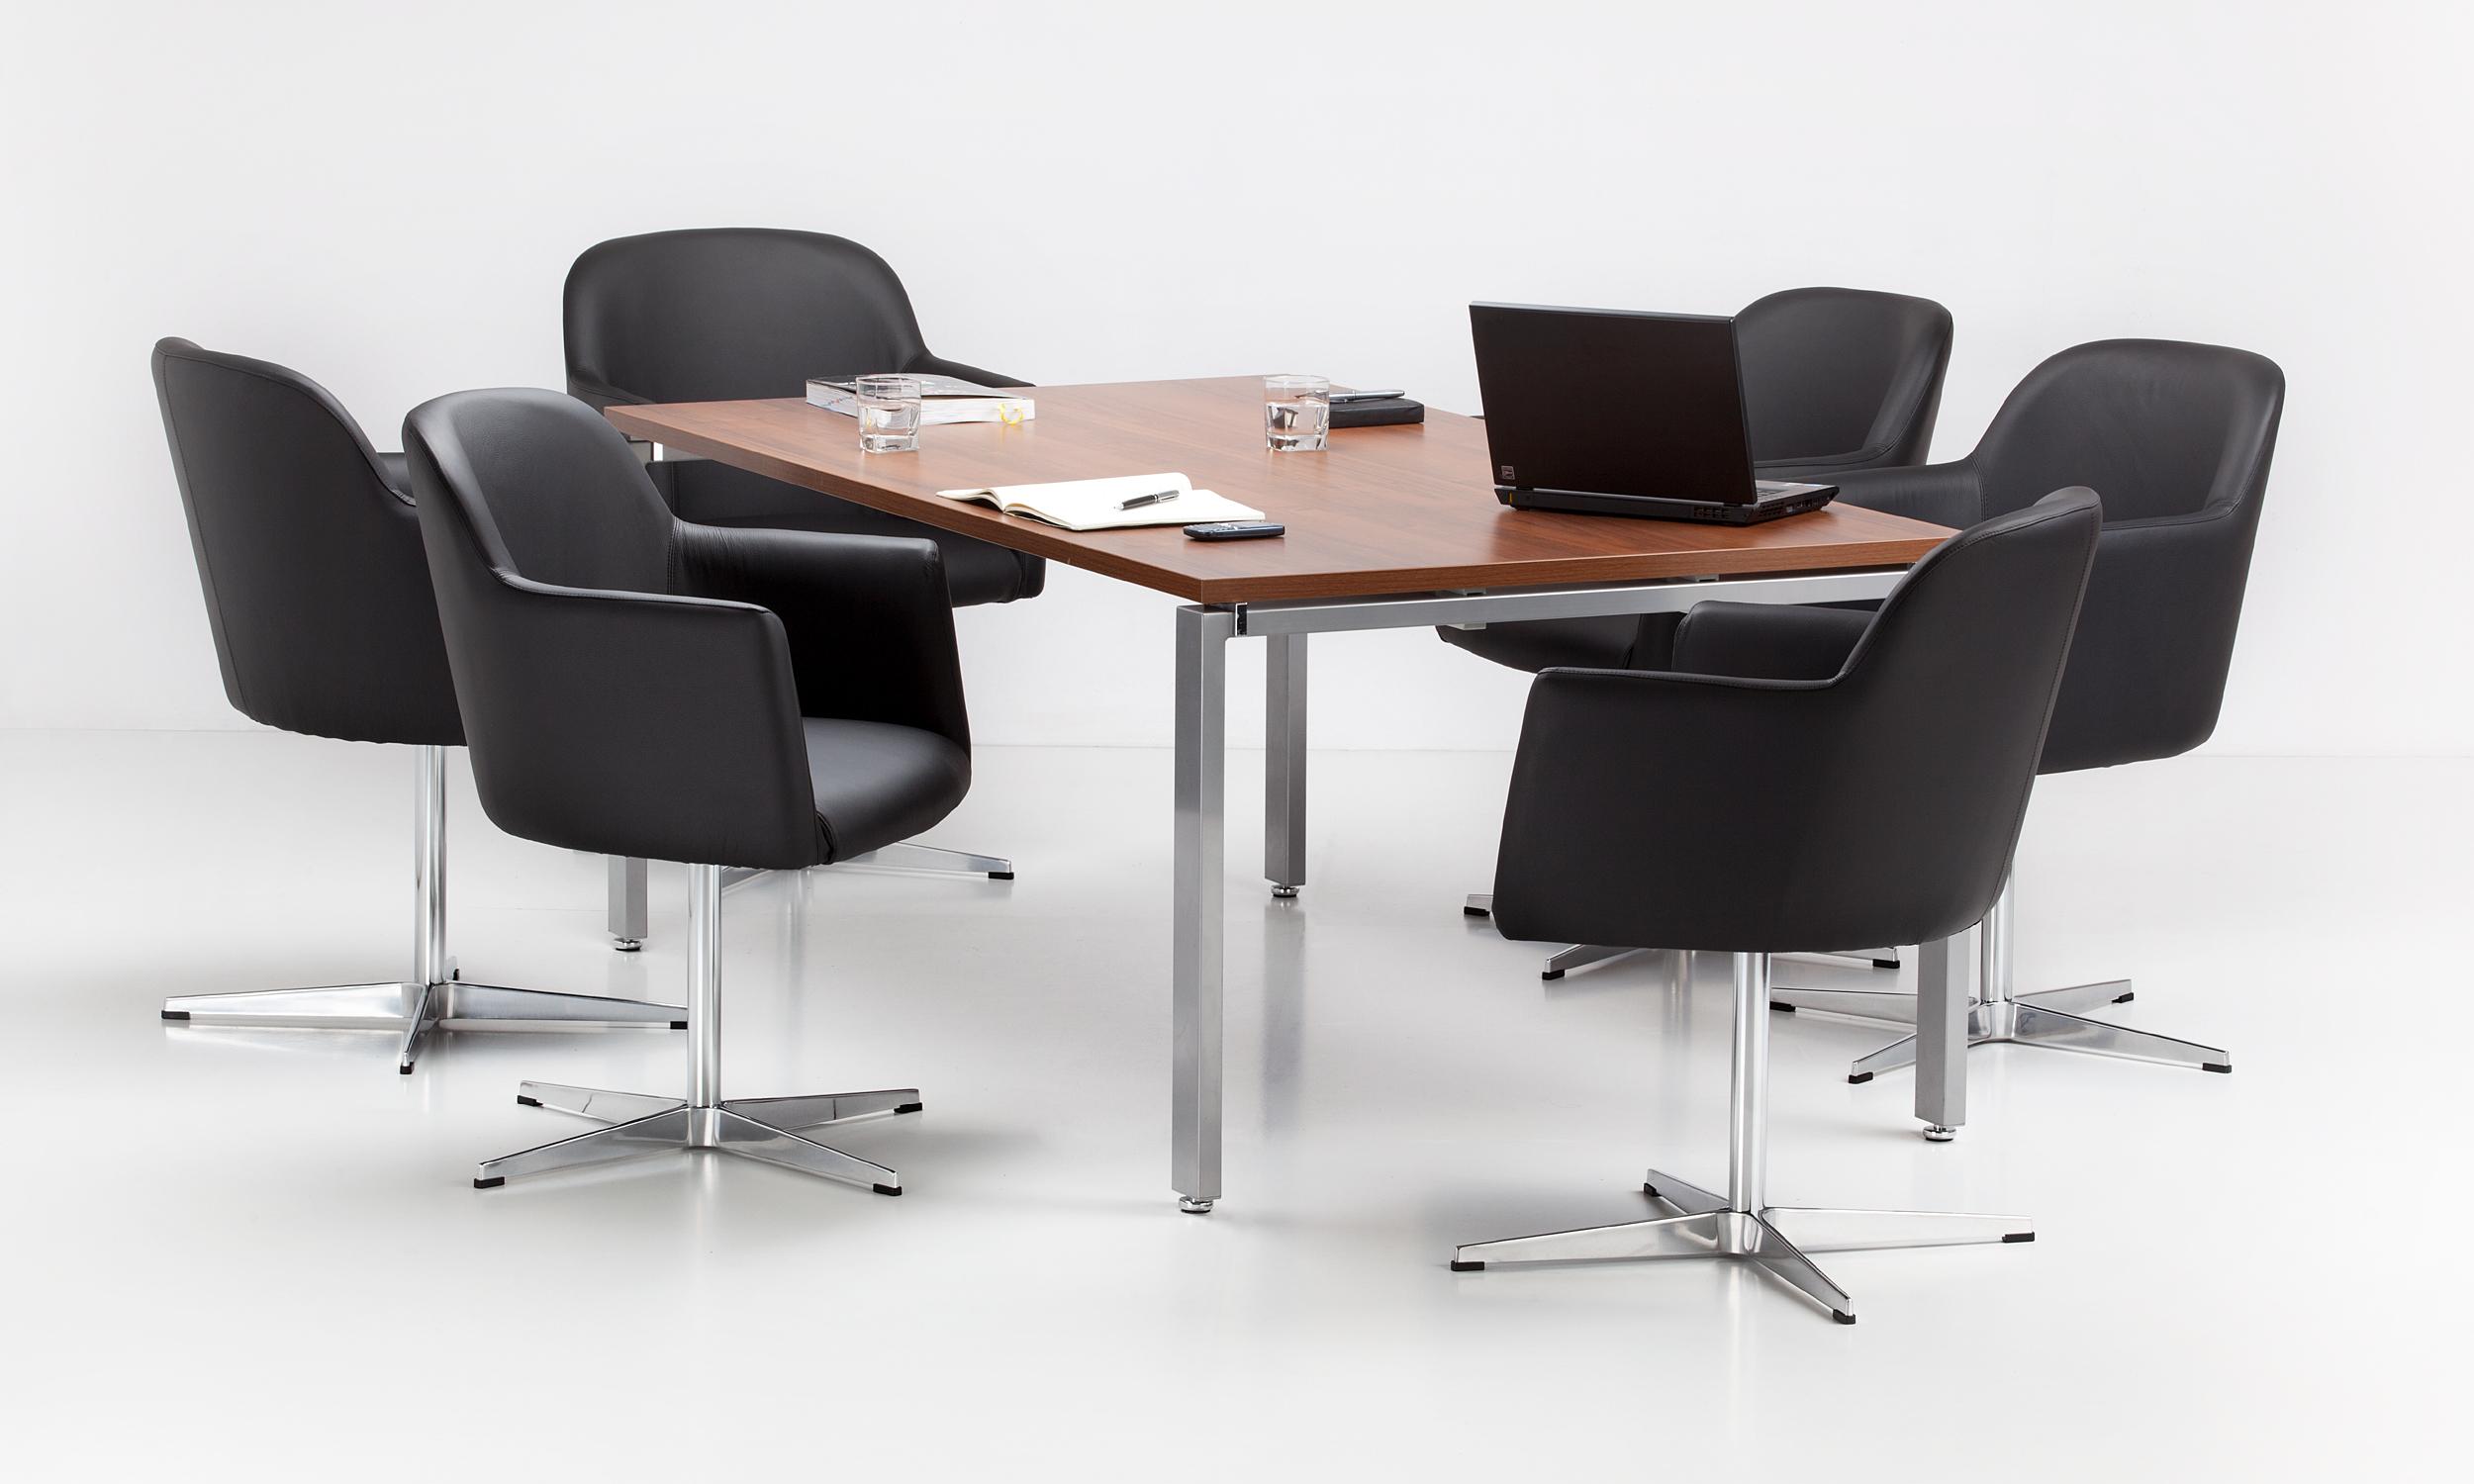 office-chairs_10-6_Athena-3.jpg